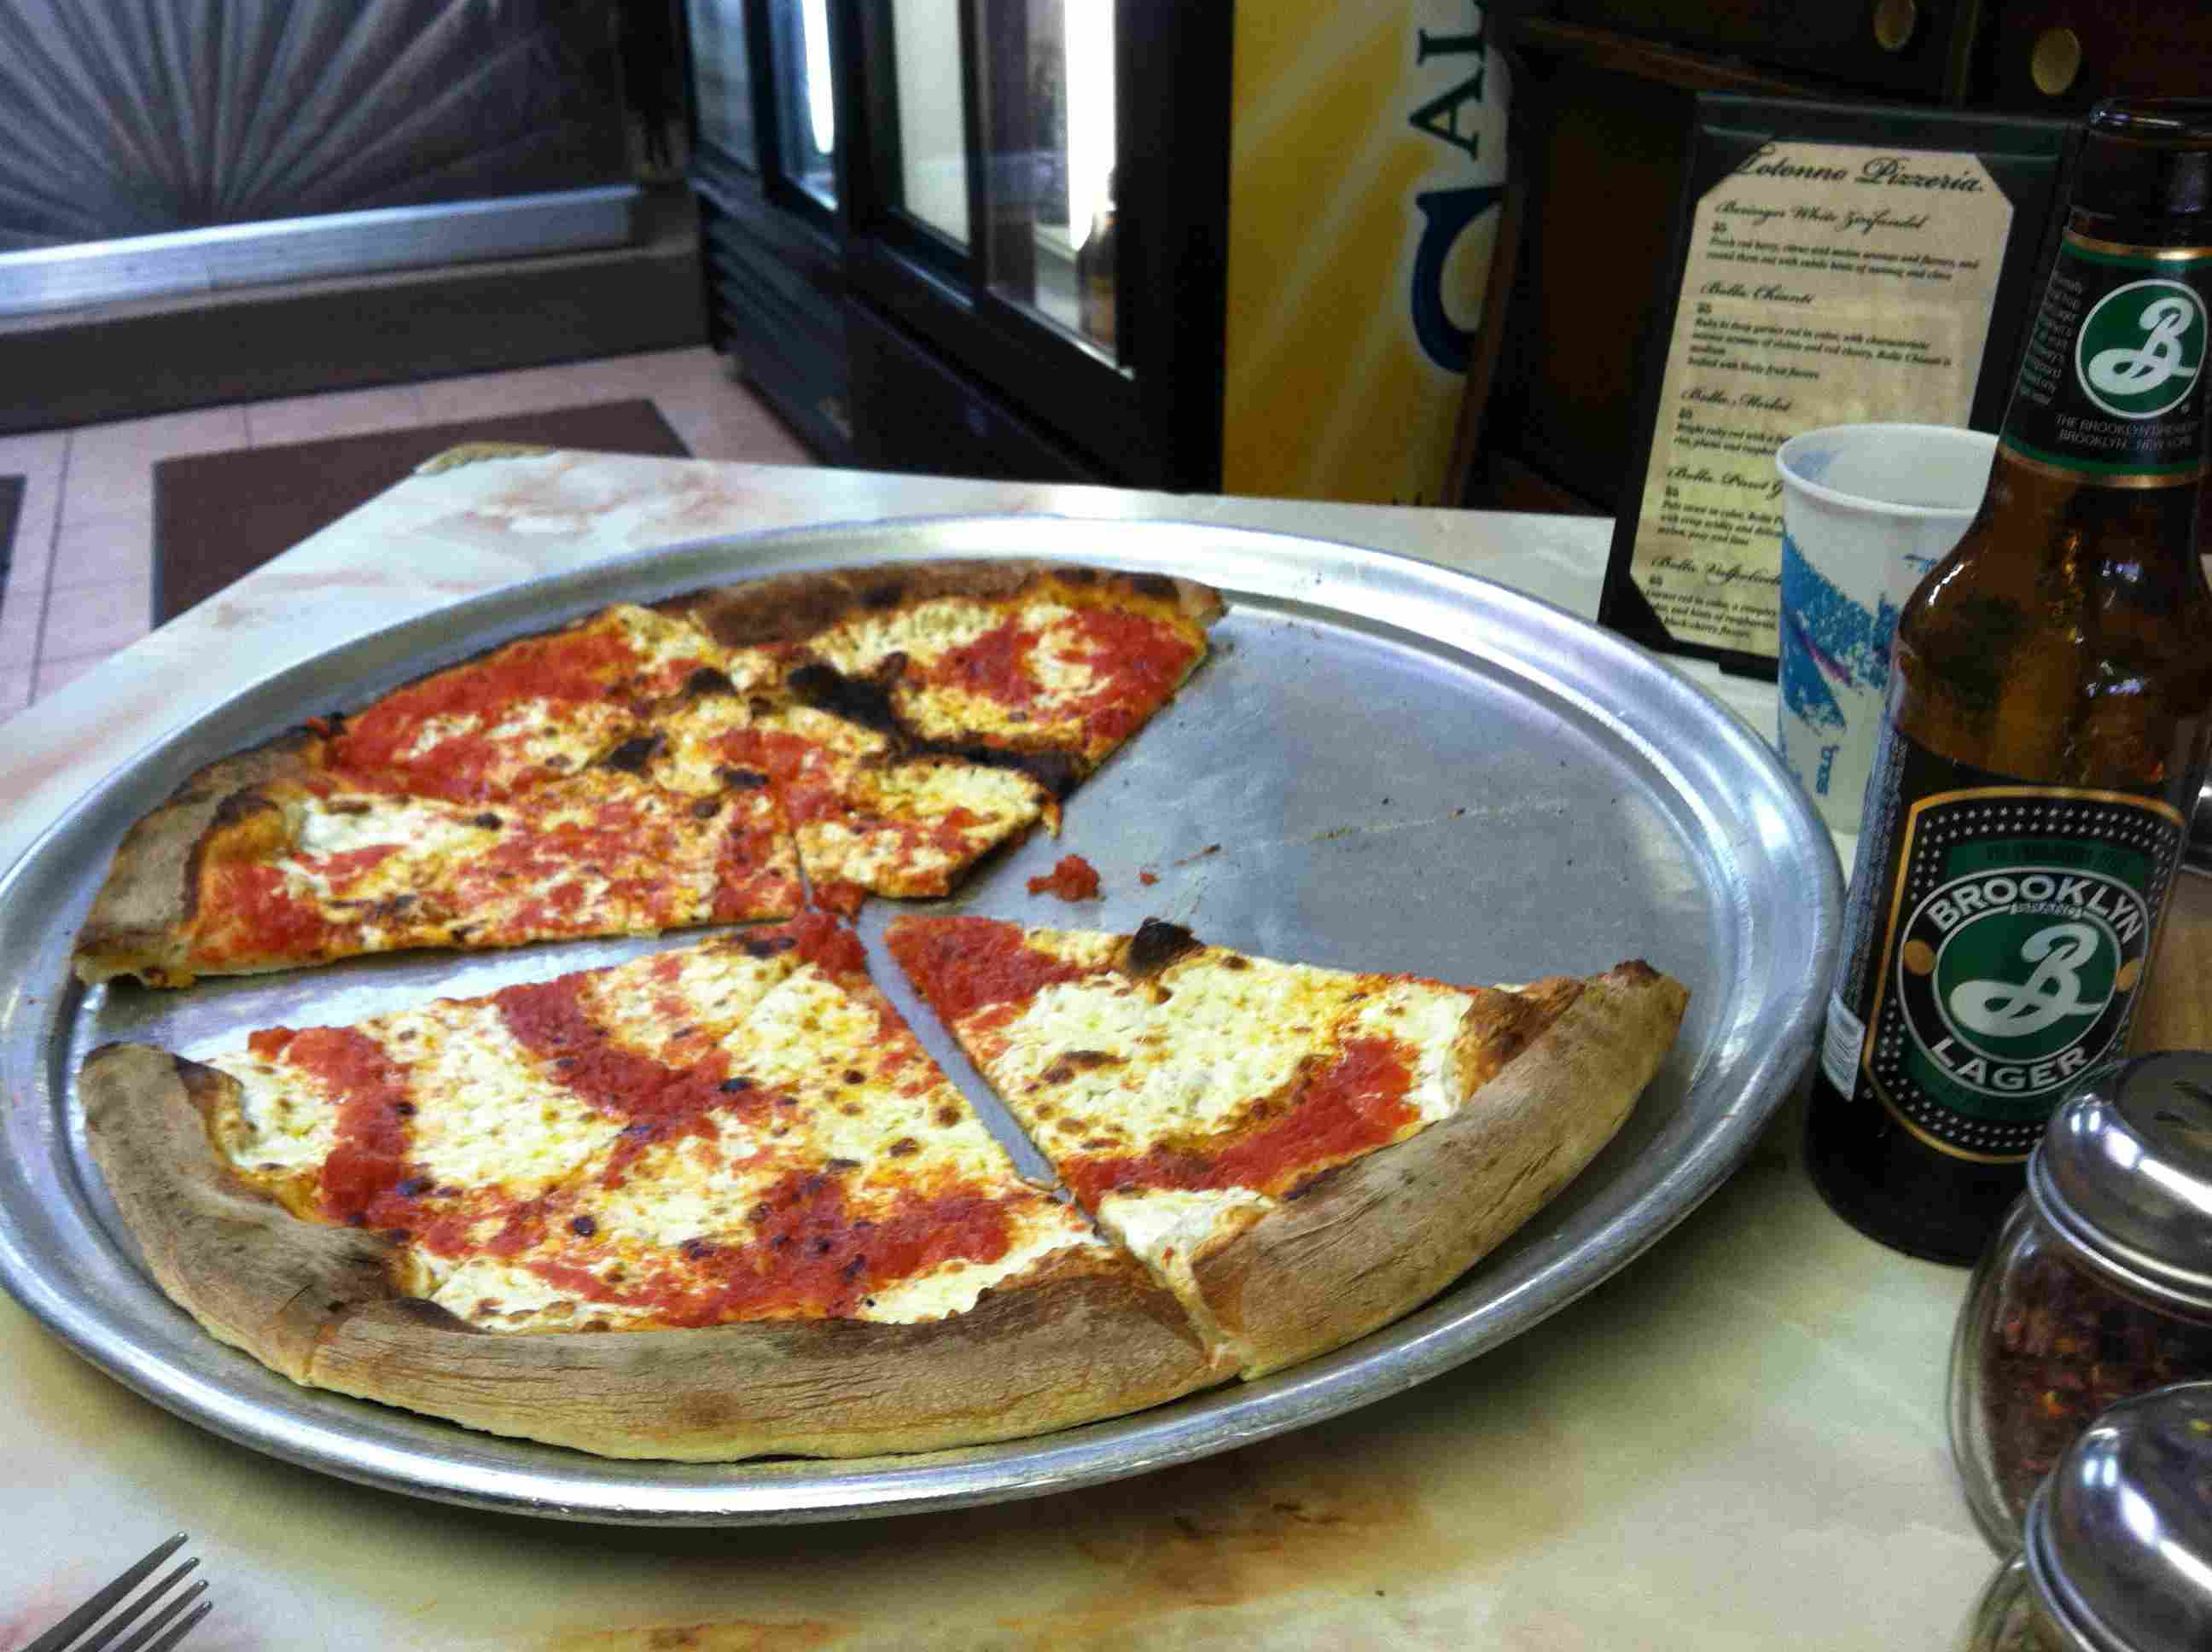 Pizza served at Totonno's Pizzeria Napolitana